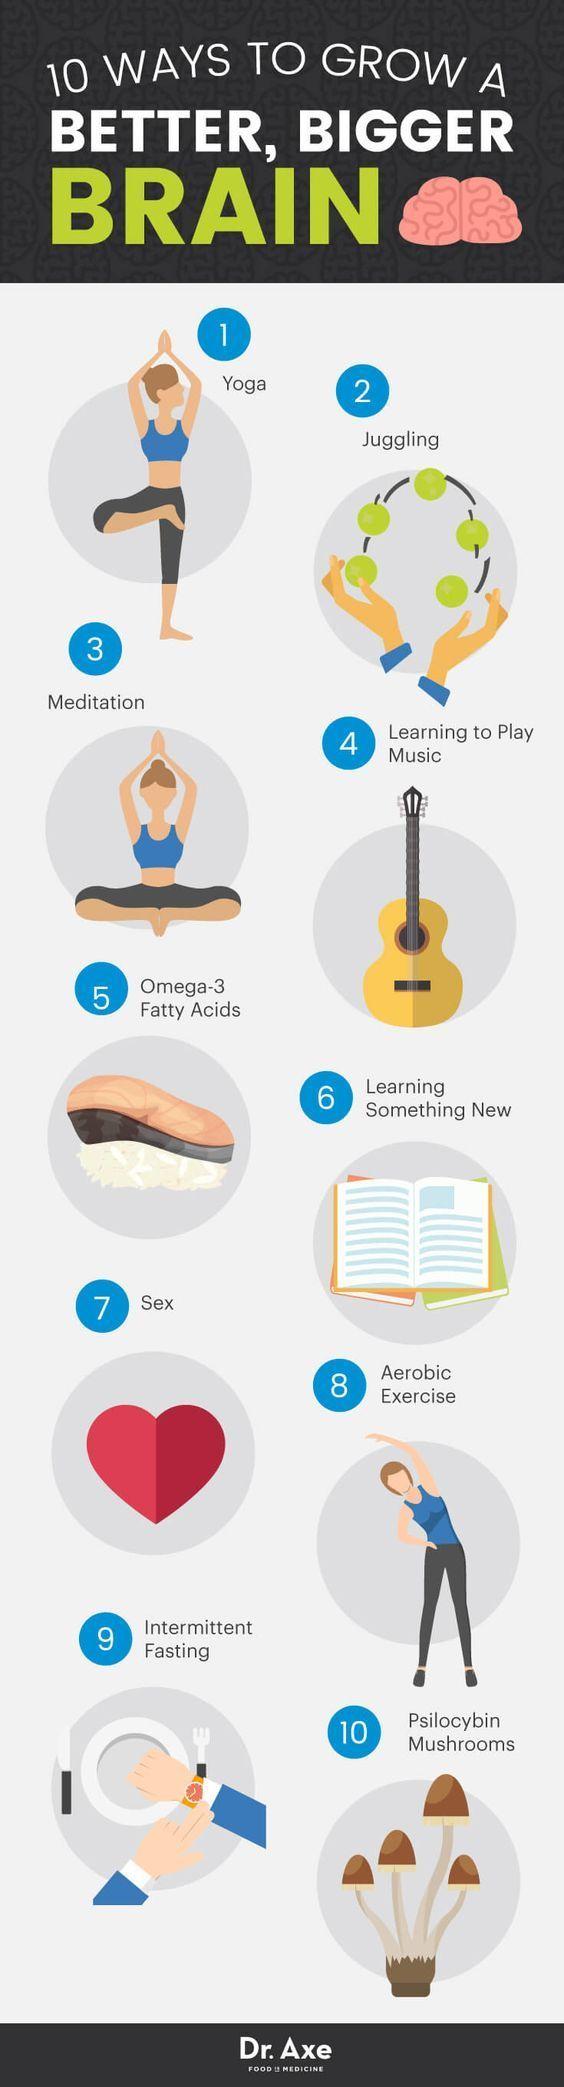 10 Ways To Grow A Bigger Better Brain